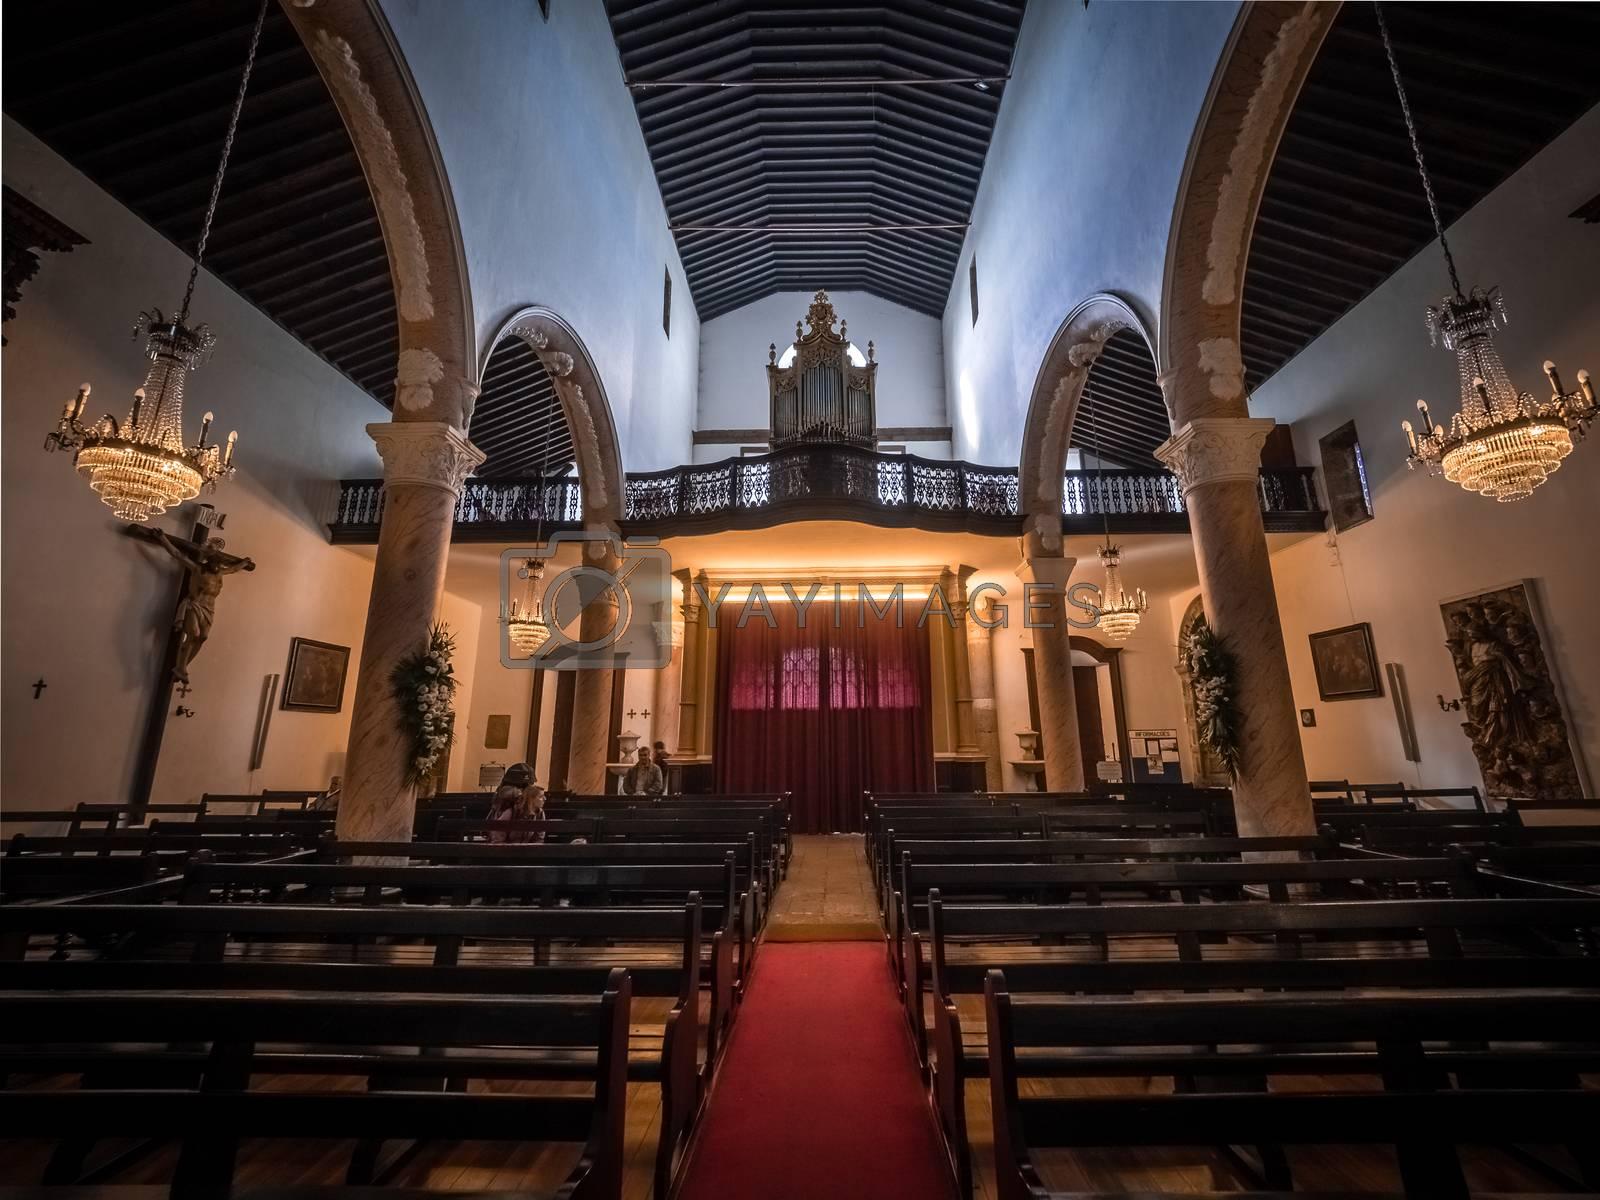 Beautiful interior of the Church of San Sebastian in Ponta Delgada, Sao Miguel Island, Azores, Portugal. Picture taken 27th January 2016.